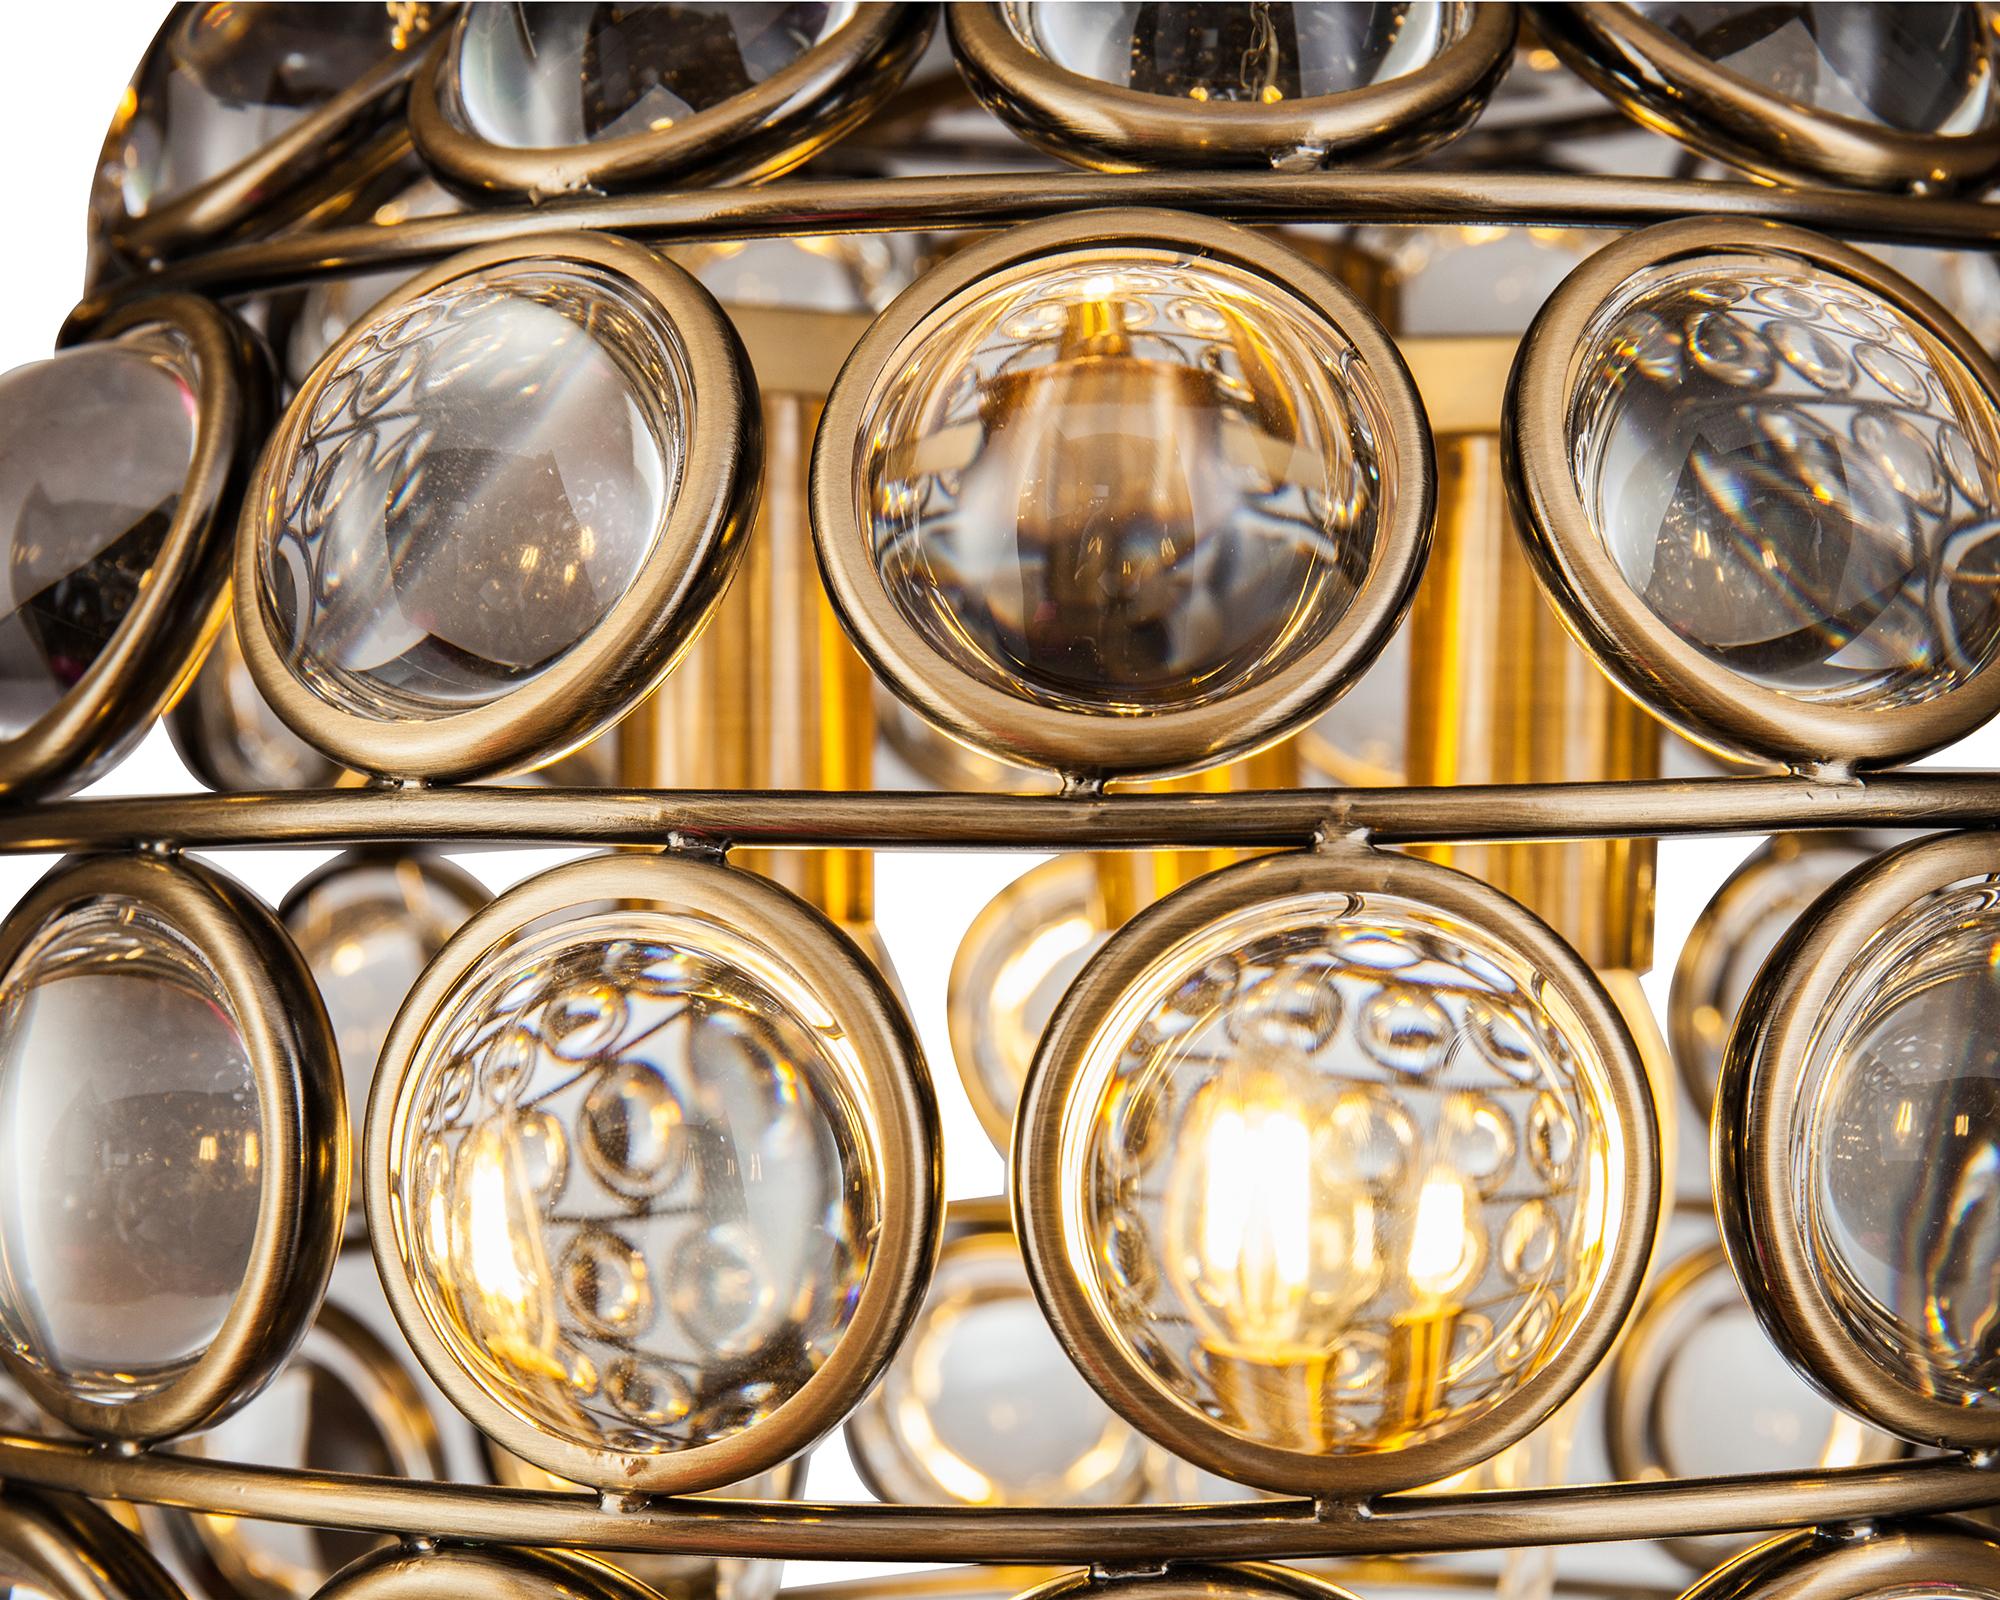 Liang & Eimil Colbert Pendant Lamp GD-LGT-0107 (3)